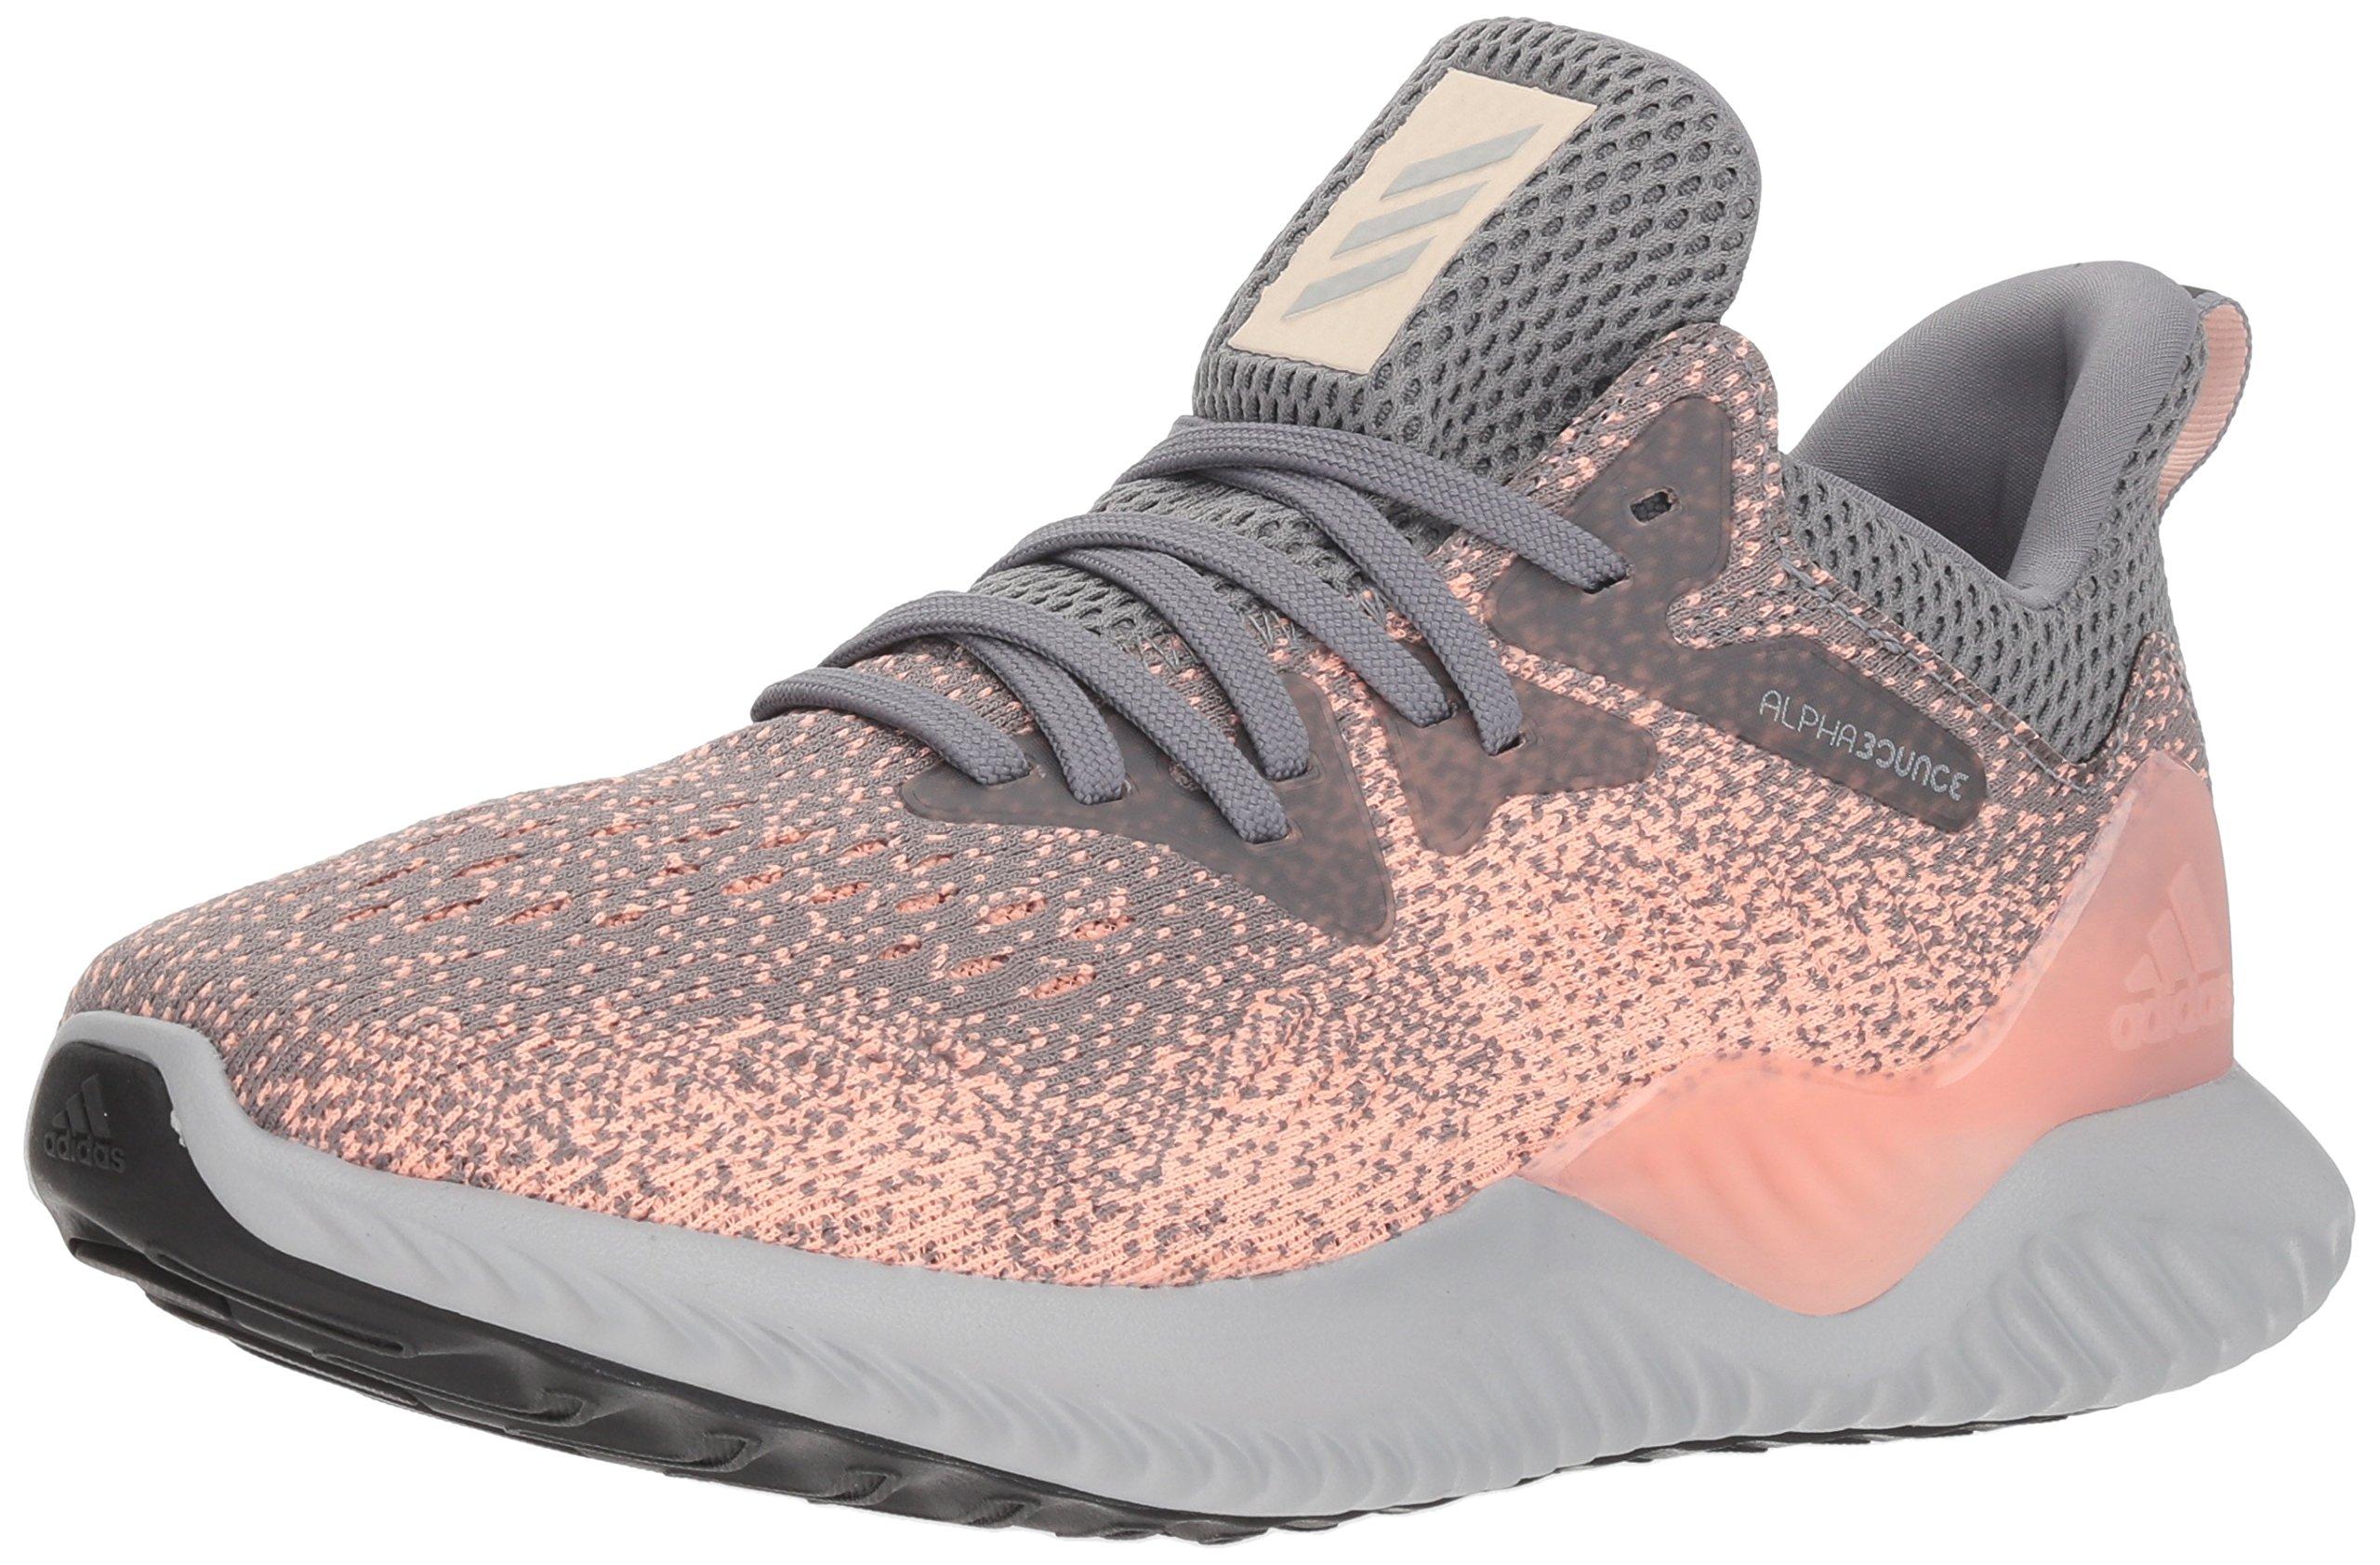 adidas women's alphabounce running shoes